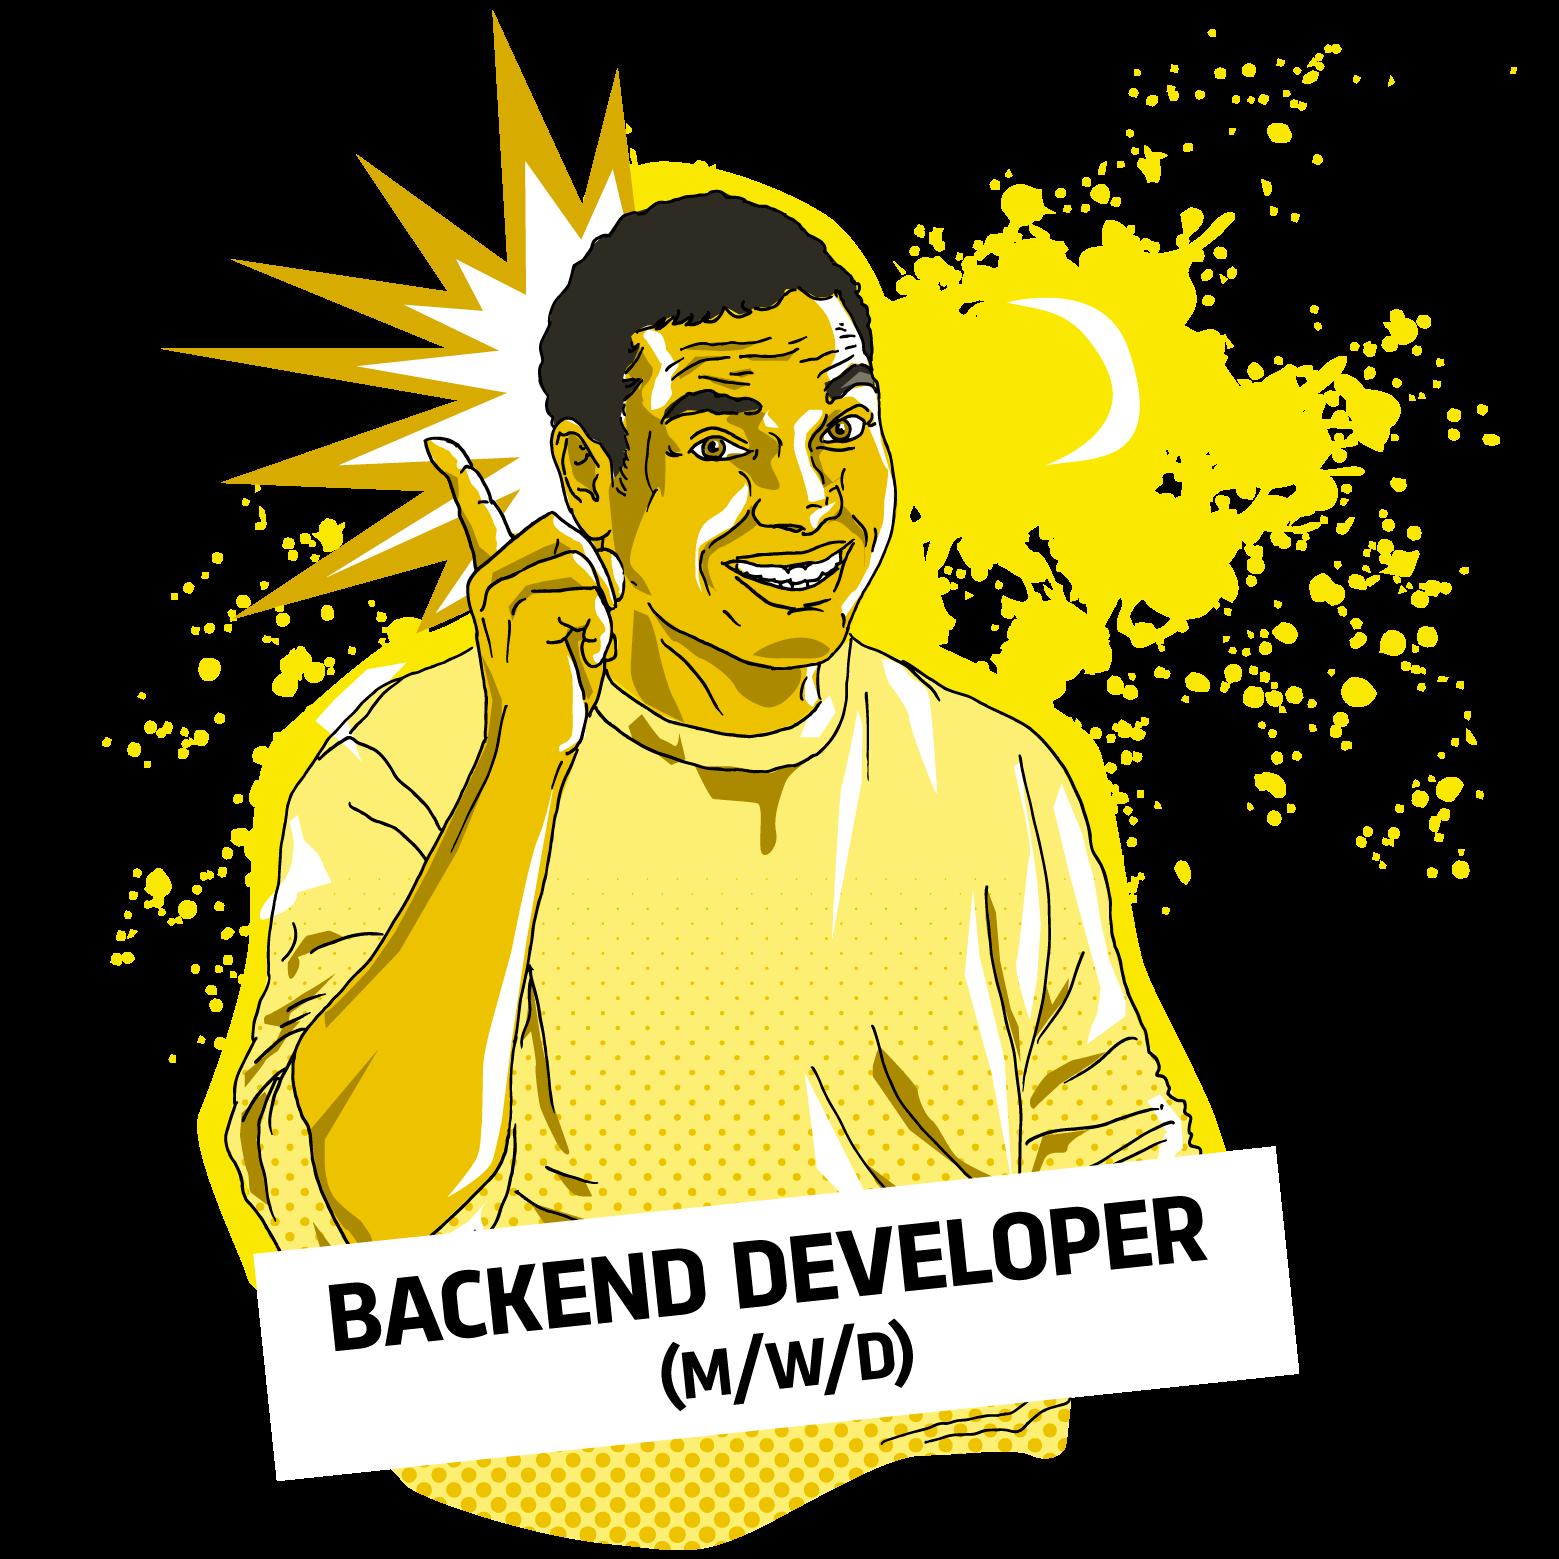 Backend Developer Blackbit